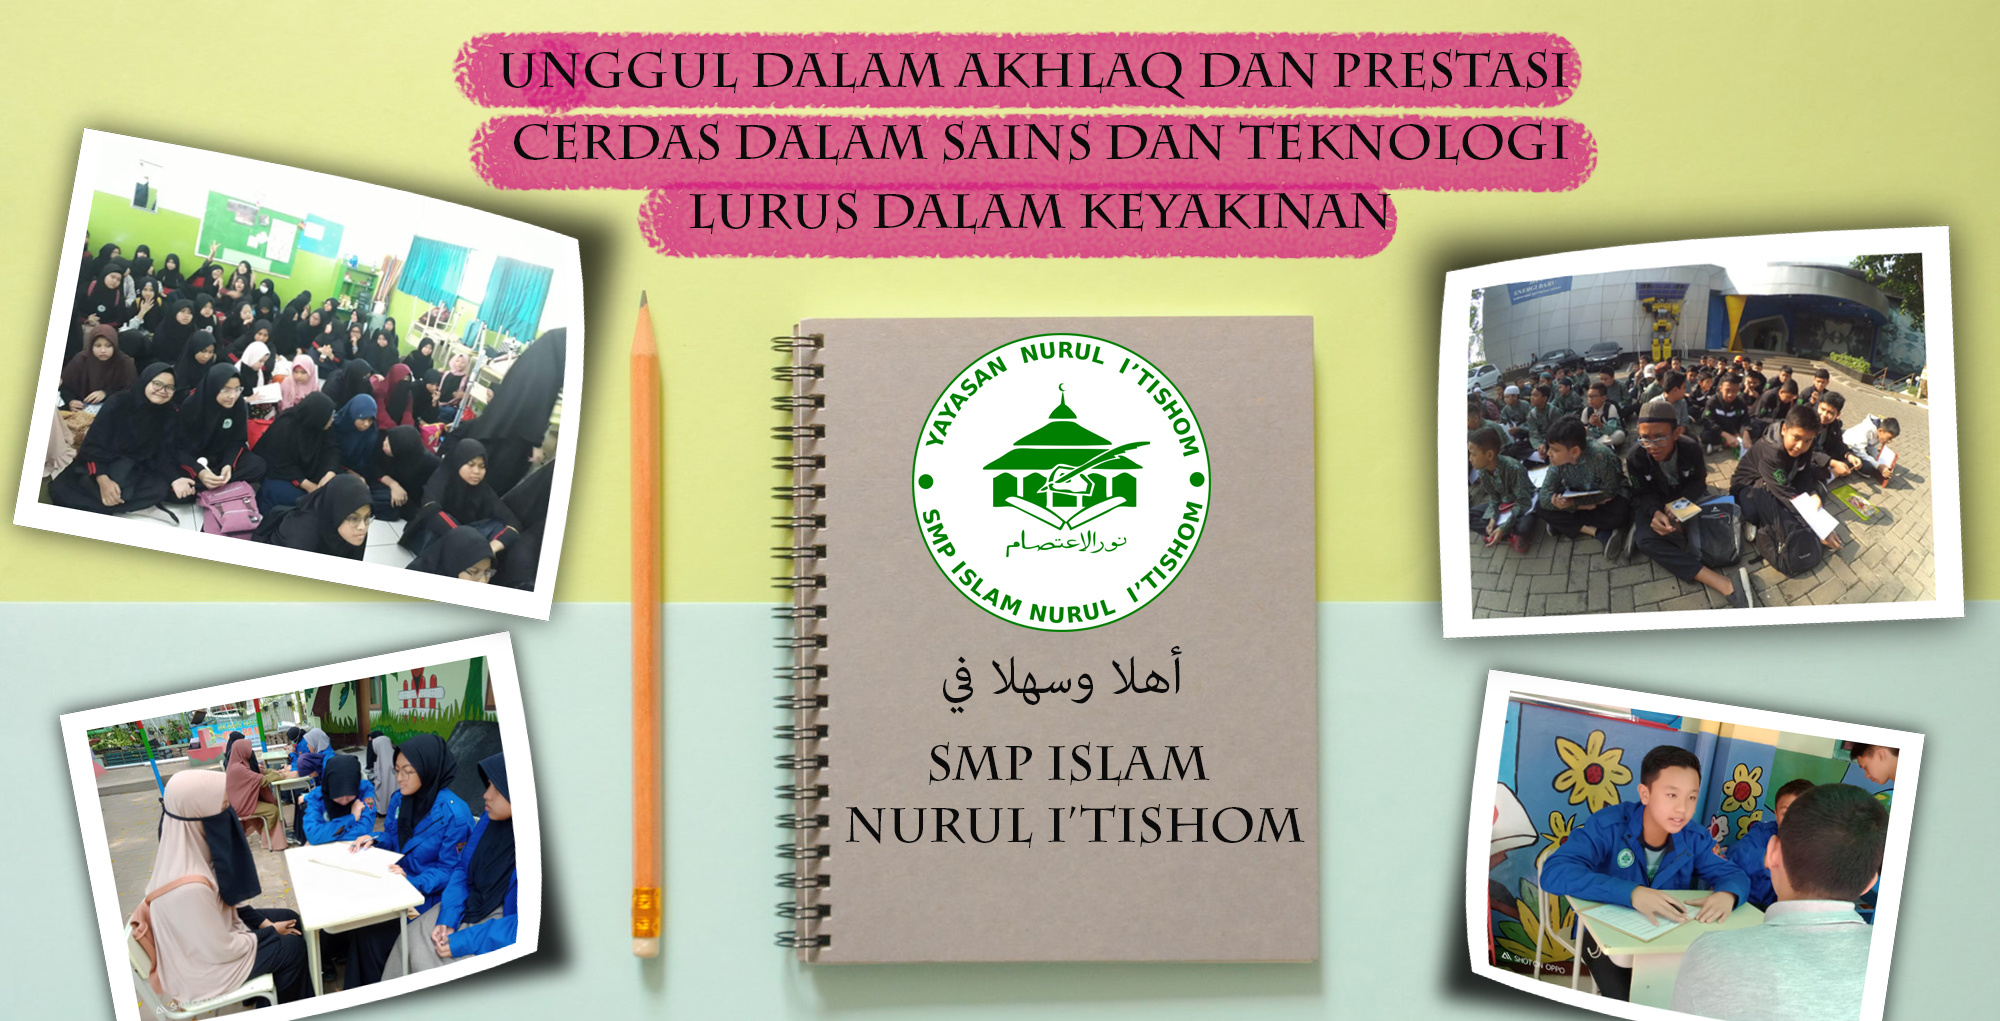 SMP Islam Nurul I'tishom